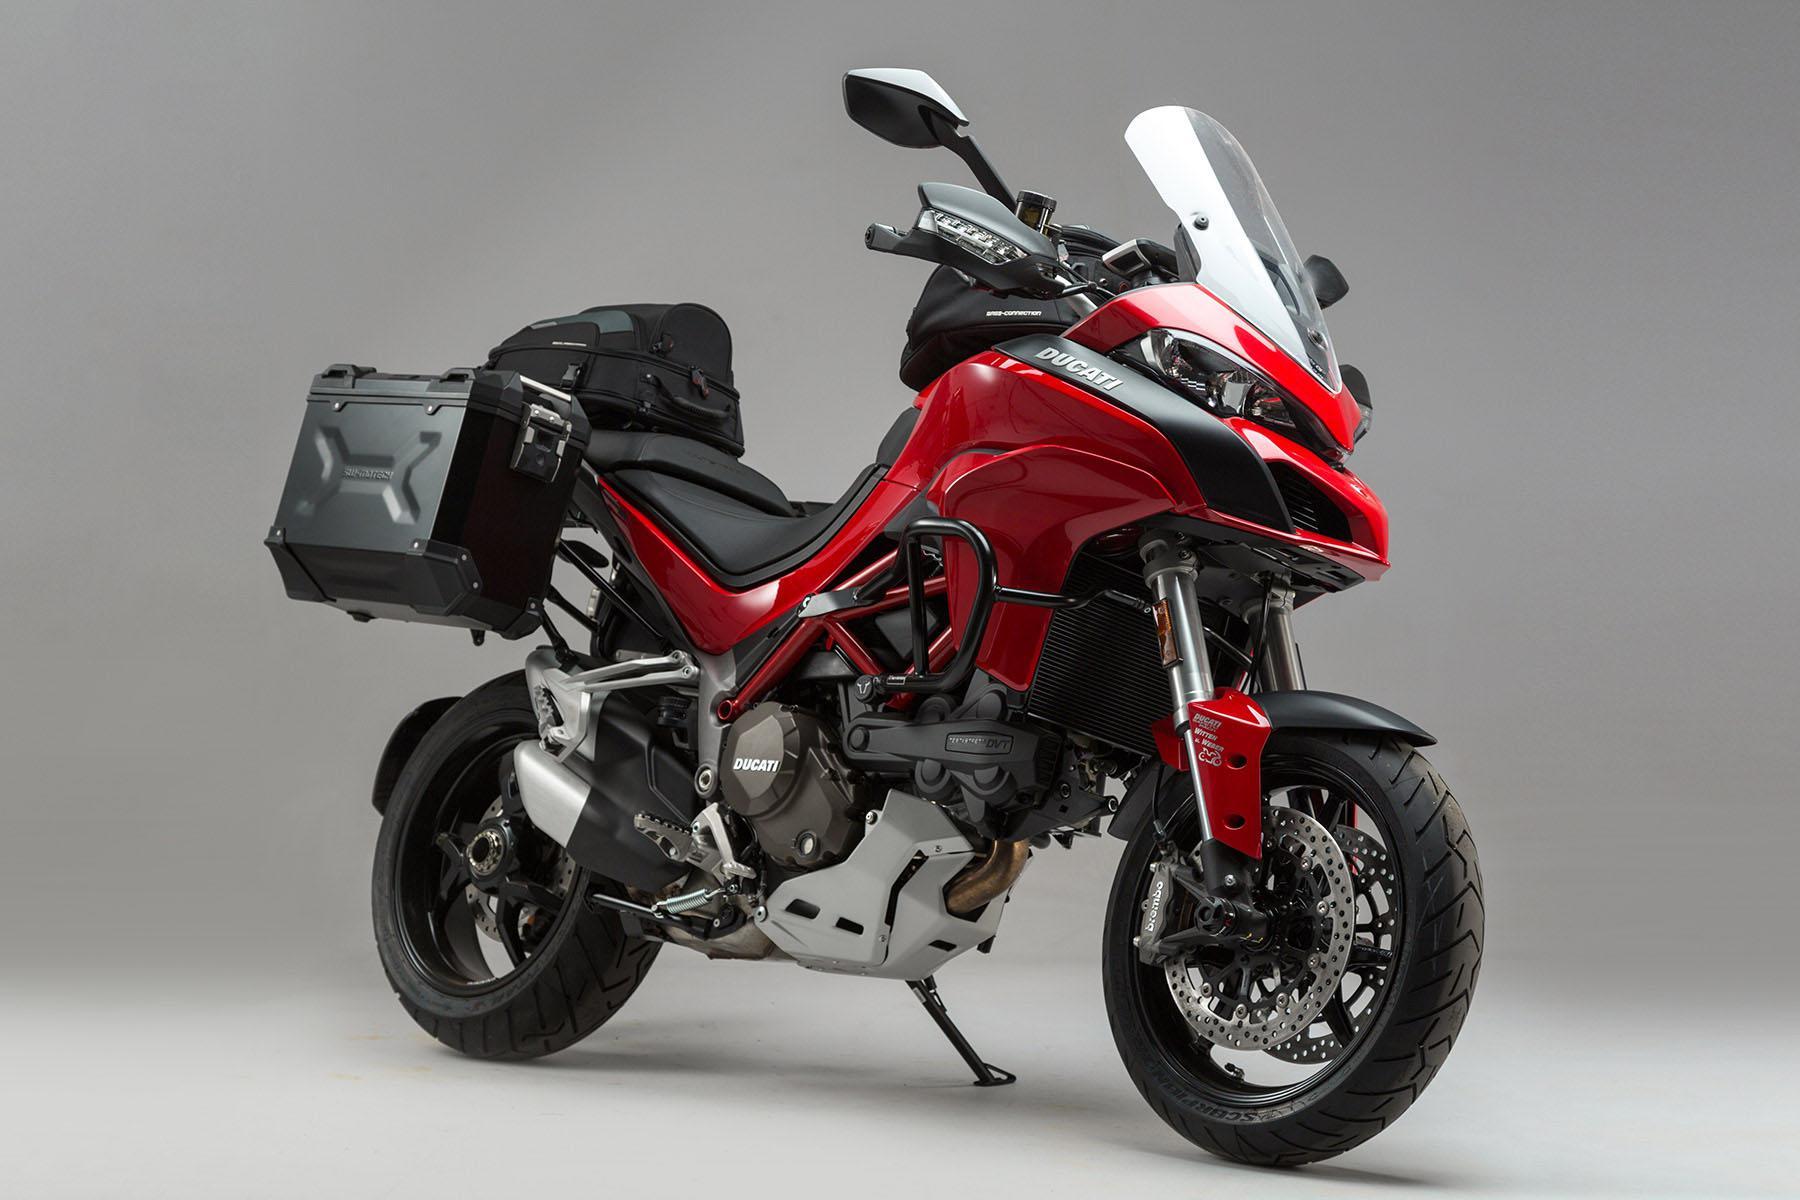 Обзор мотоцикла Ducati Multistrada 1200